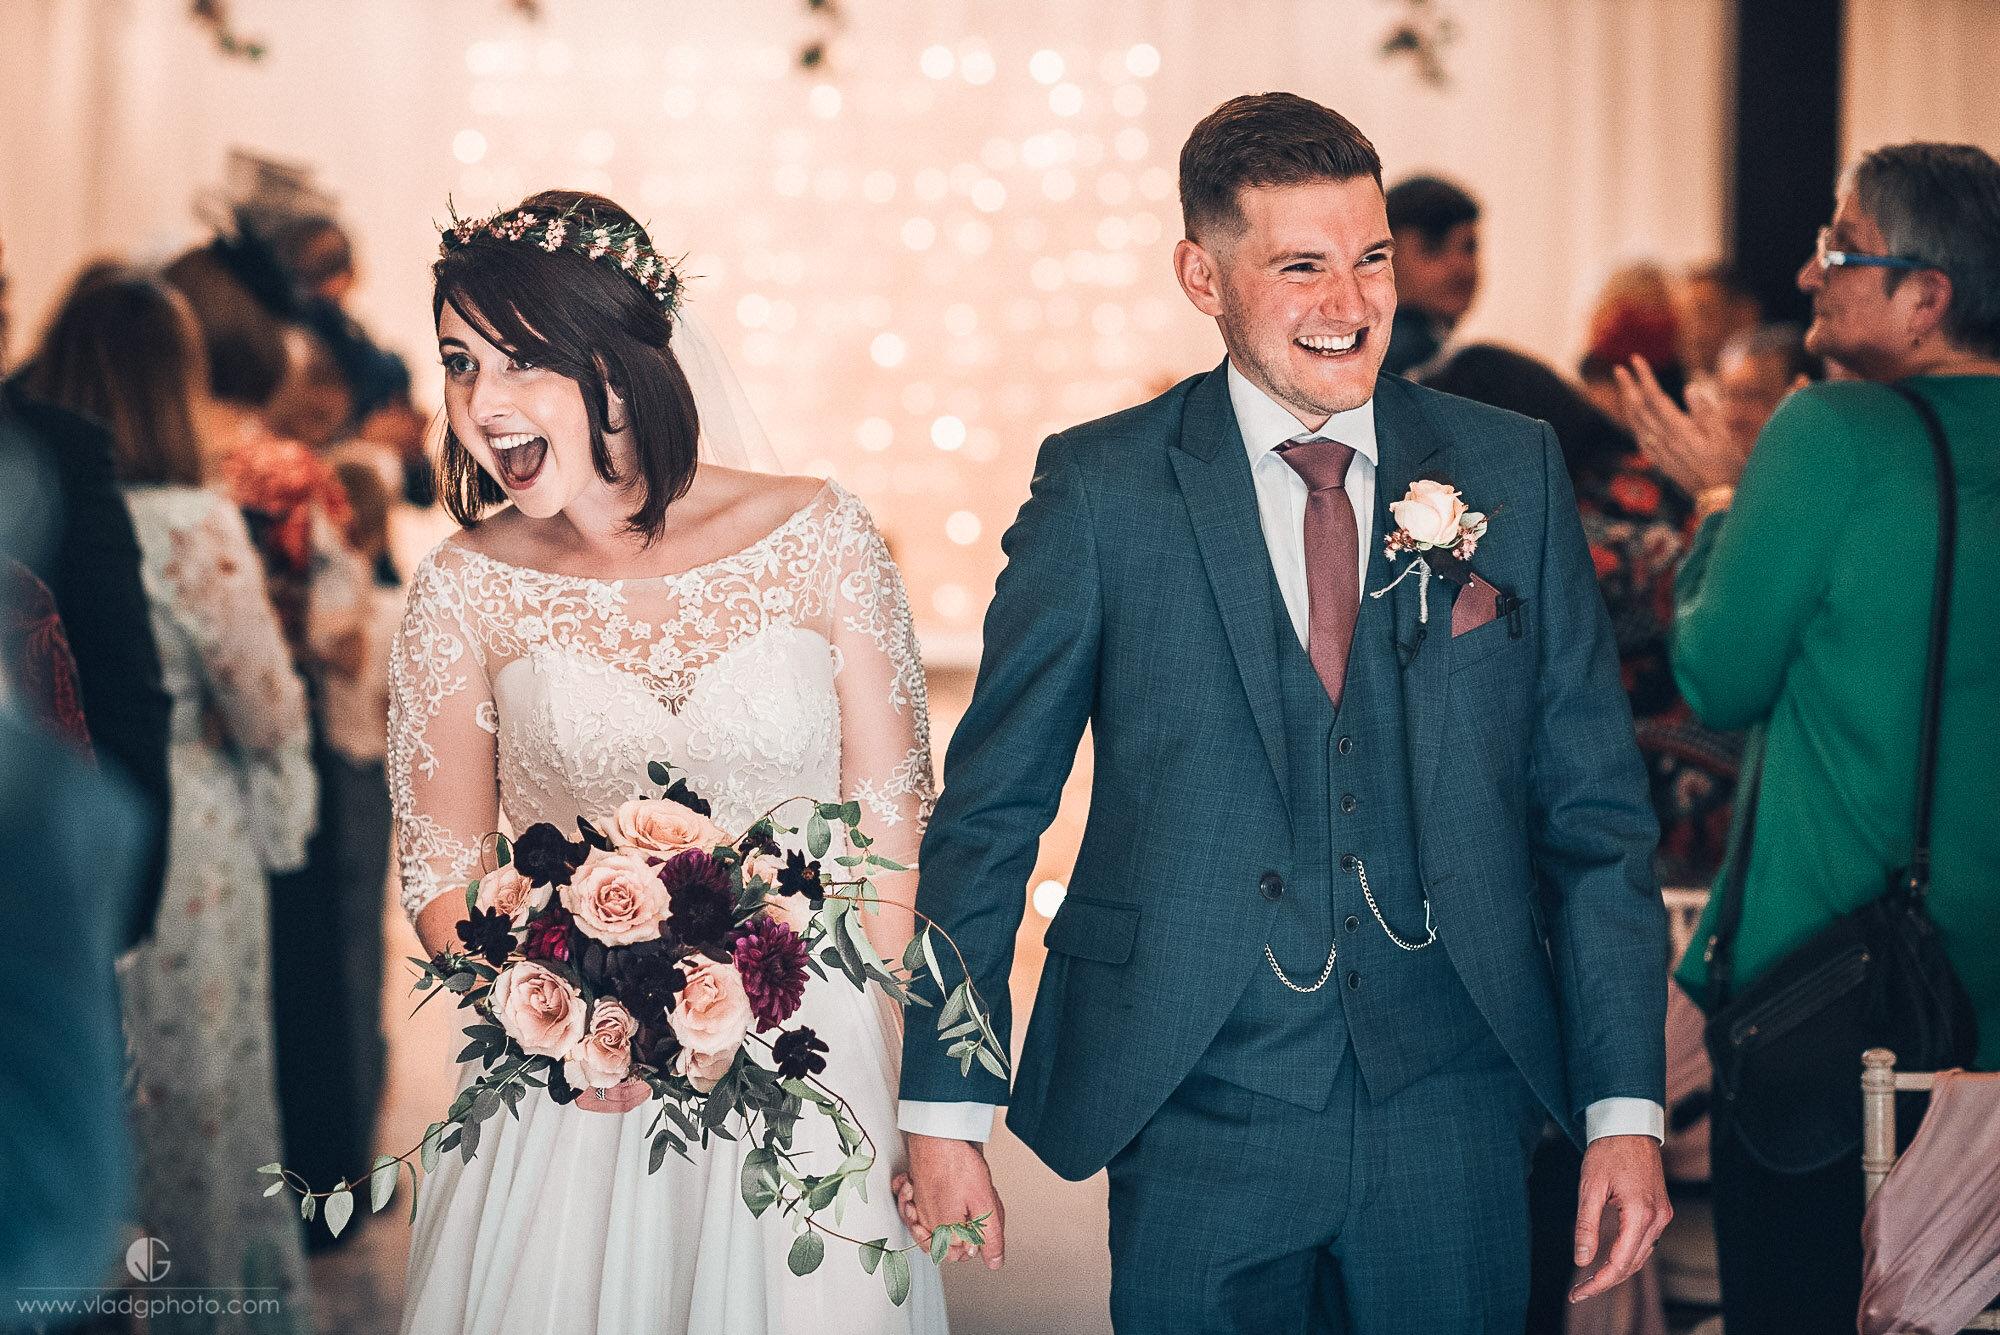 Stirk House Wedding Photographer Gisburn_10.jpg